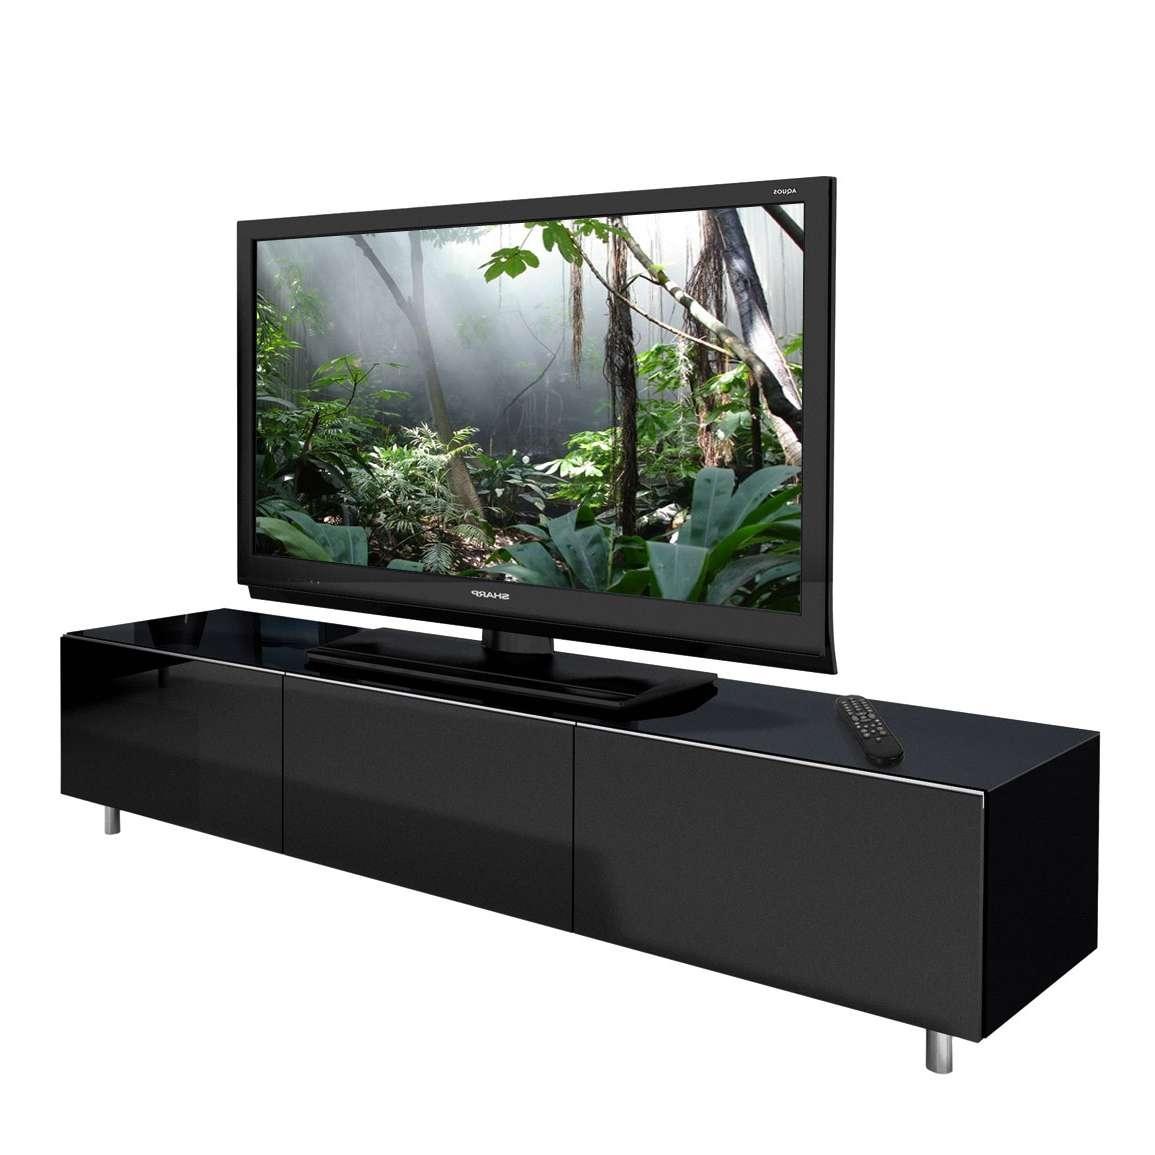 Spectral Just Racks Jrl1650s Gloss Black Tv Cabinet – Just Racks Intended For Shiny Black Tv Stands (View 2 of 15)